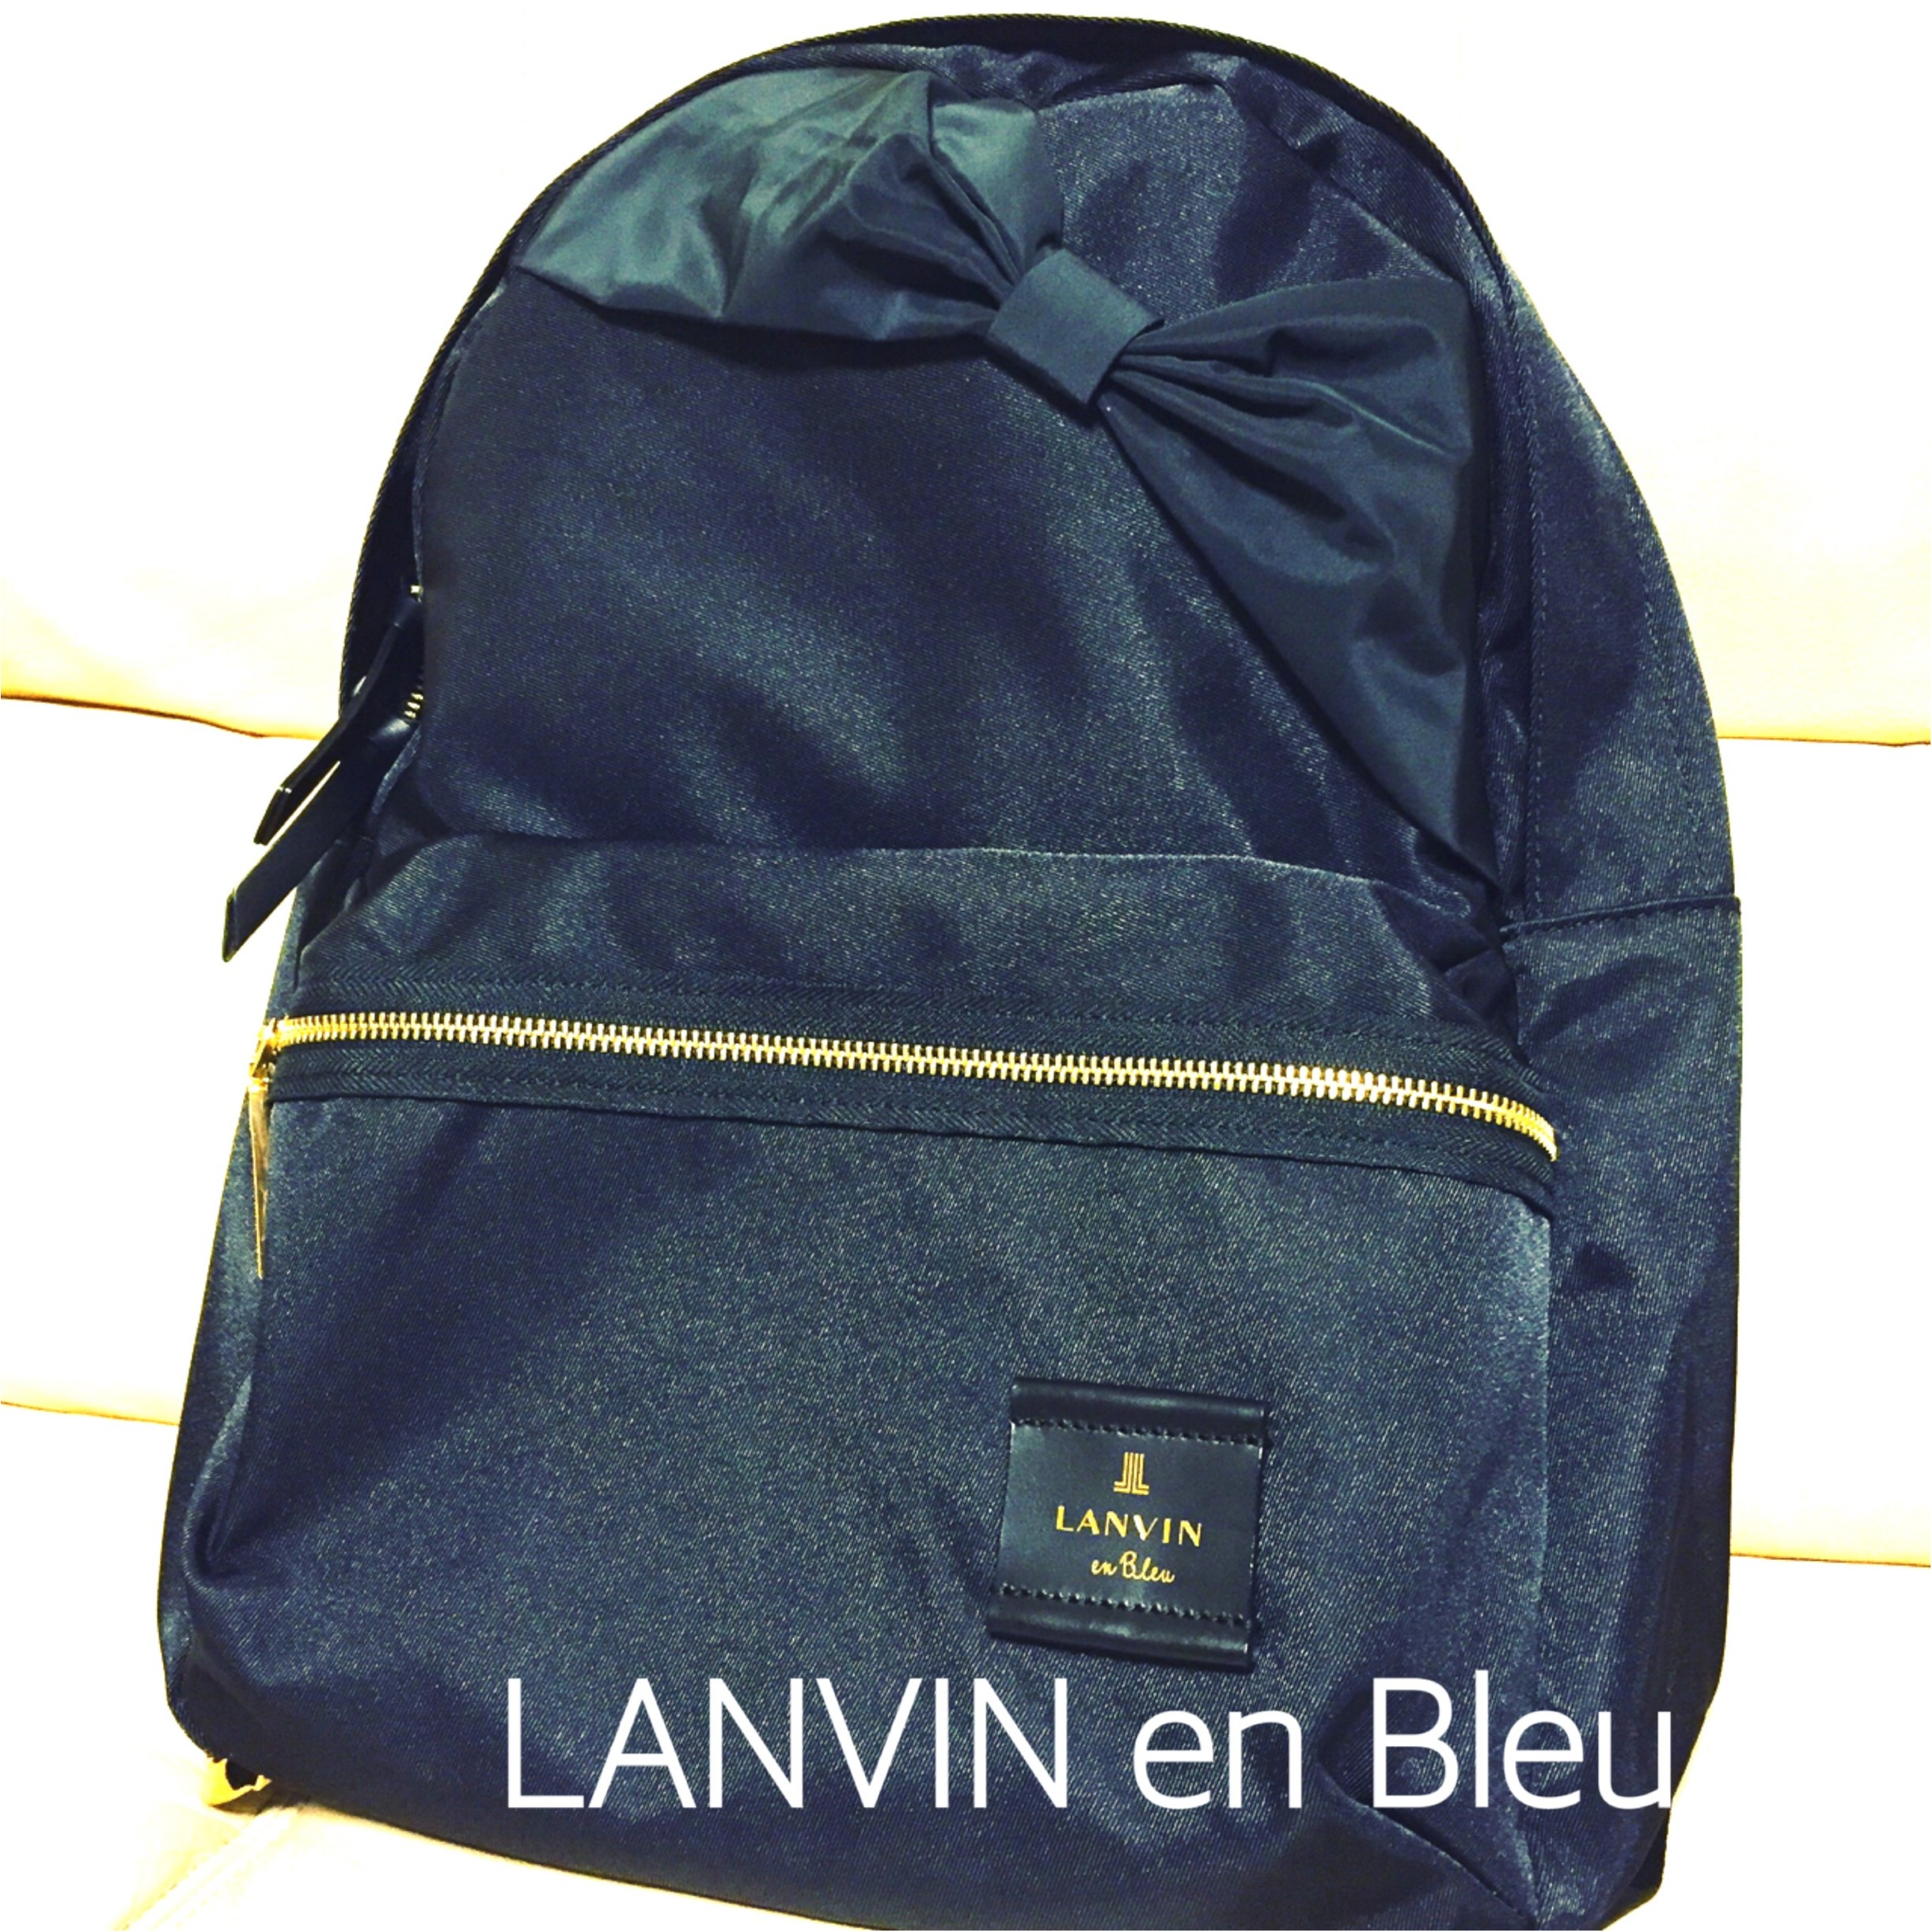 ❤︎大人かわいい❤︎LANVIN en Bleuのリボンリュック_1